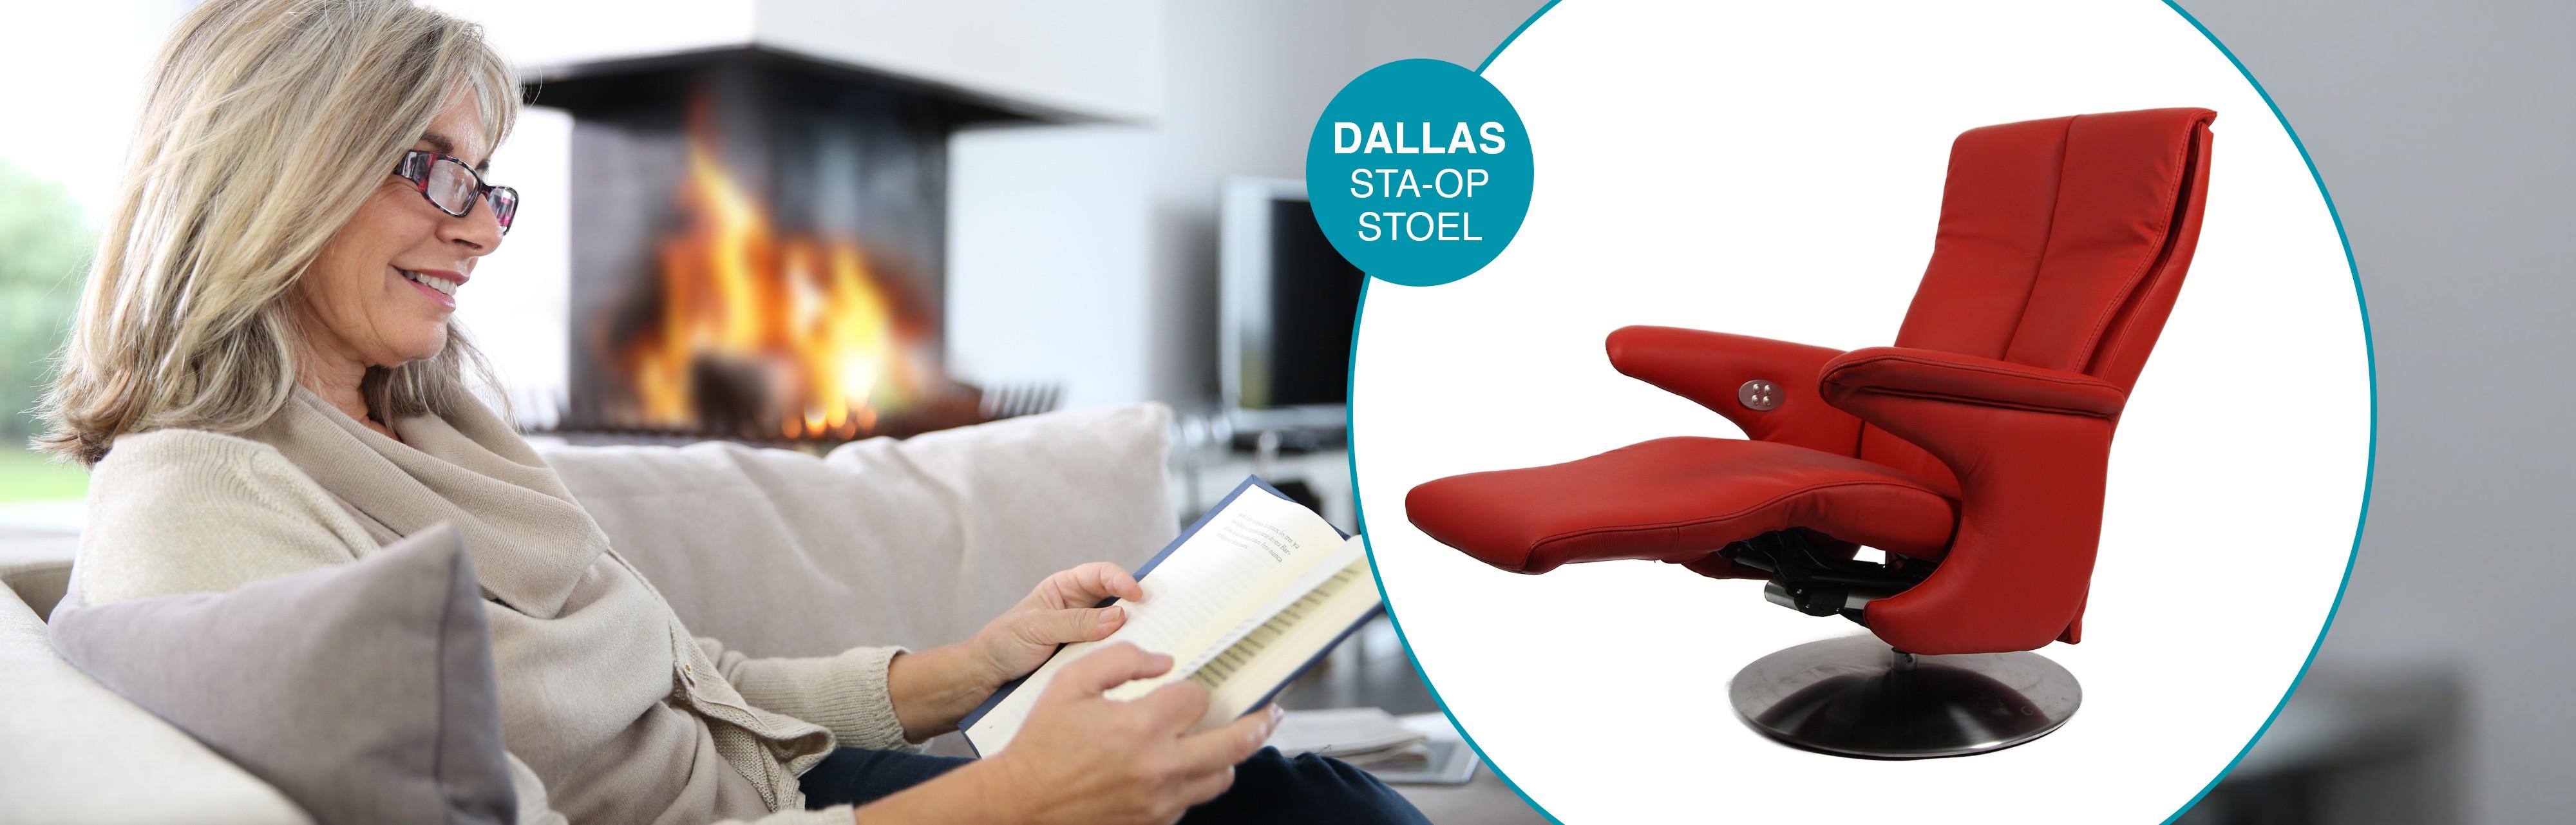 Dallas Sta-op-stoel